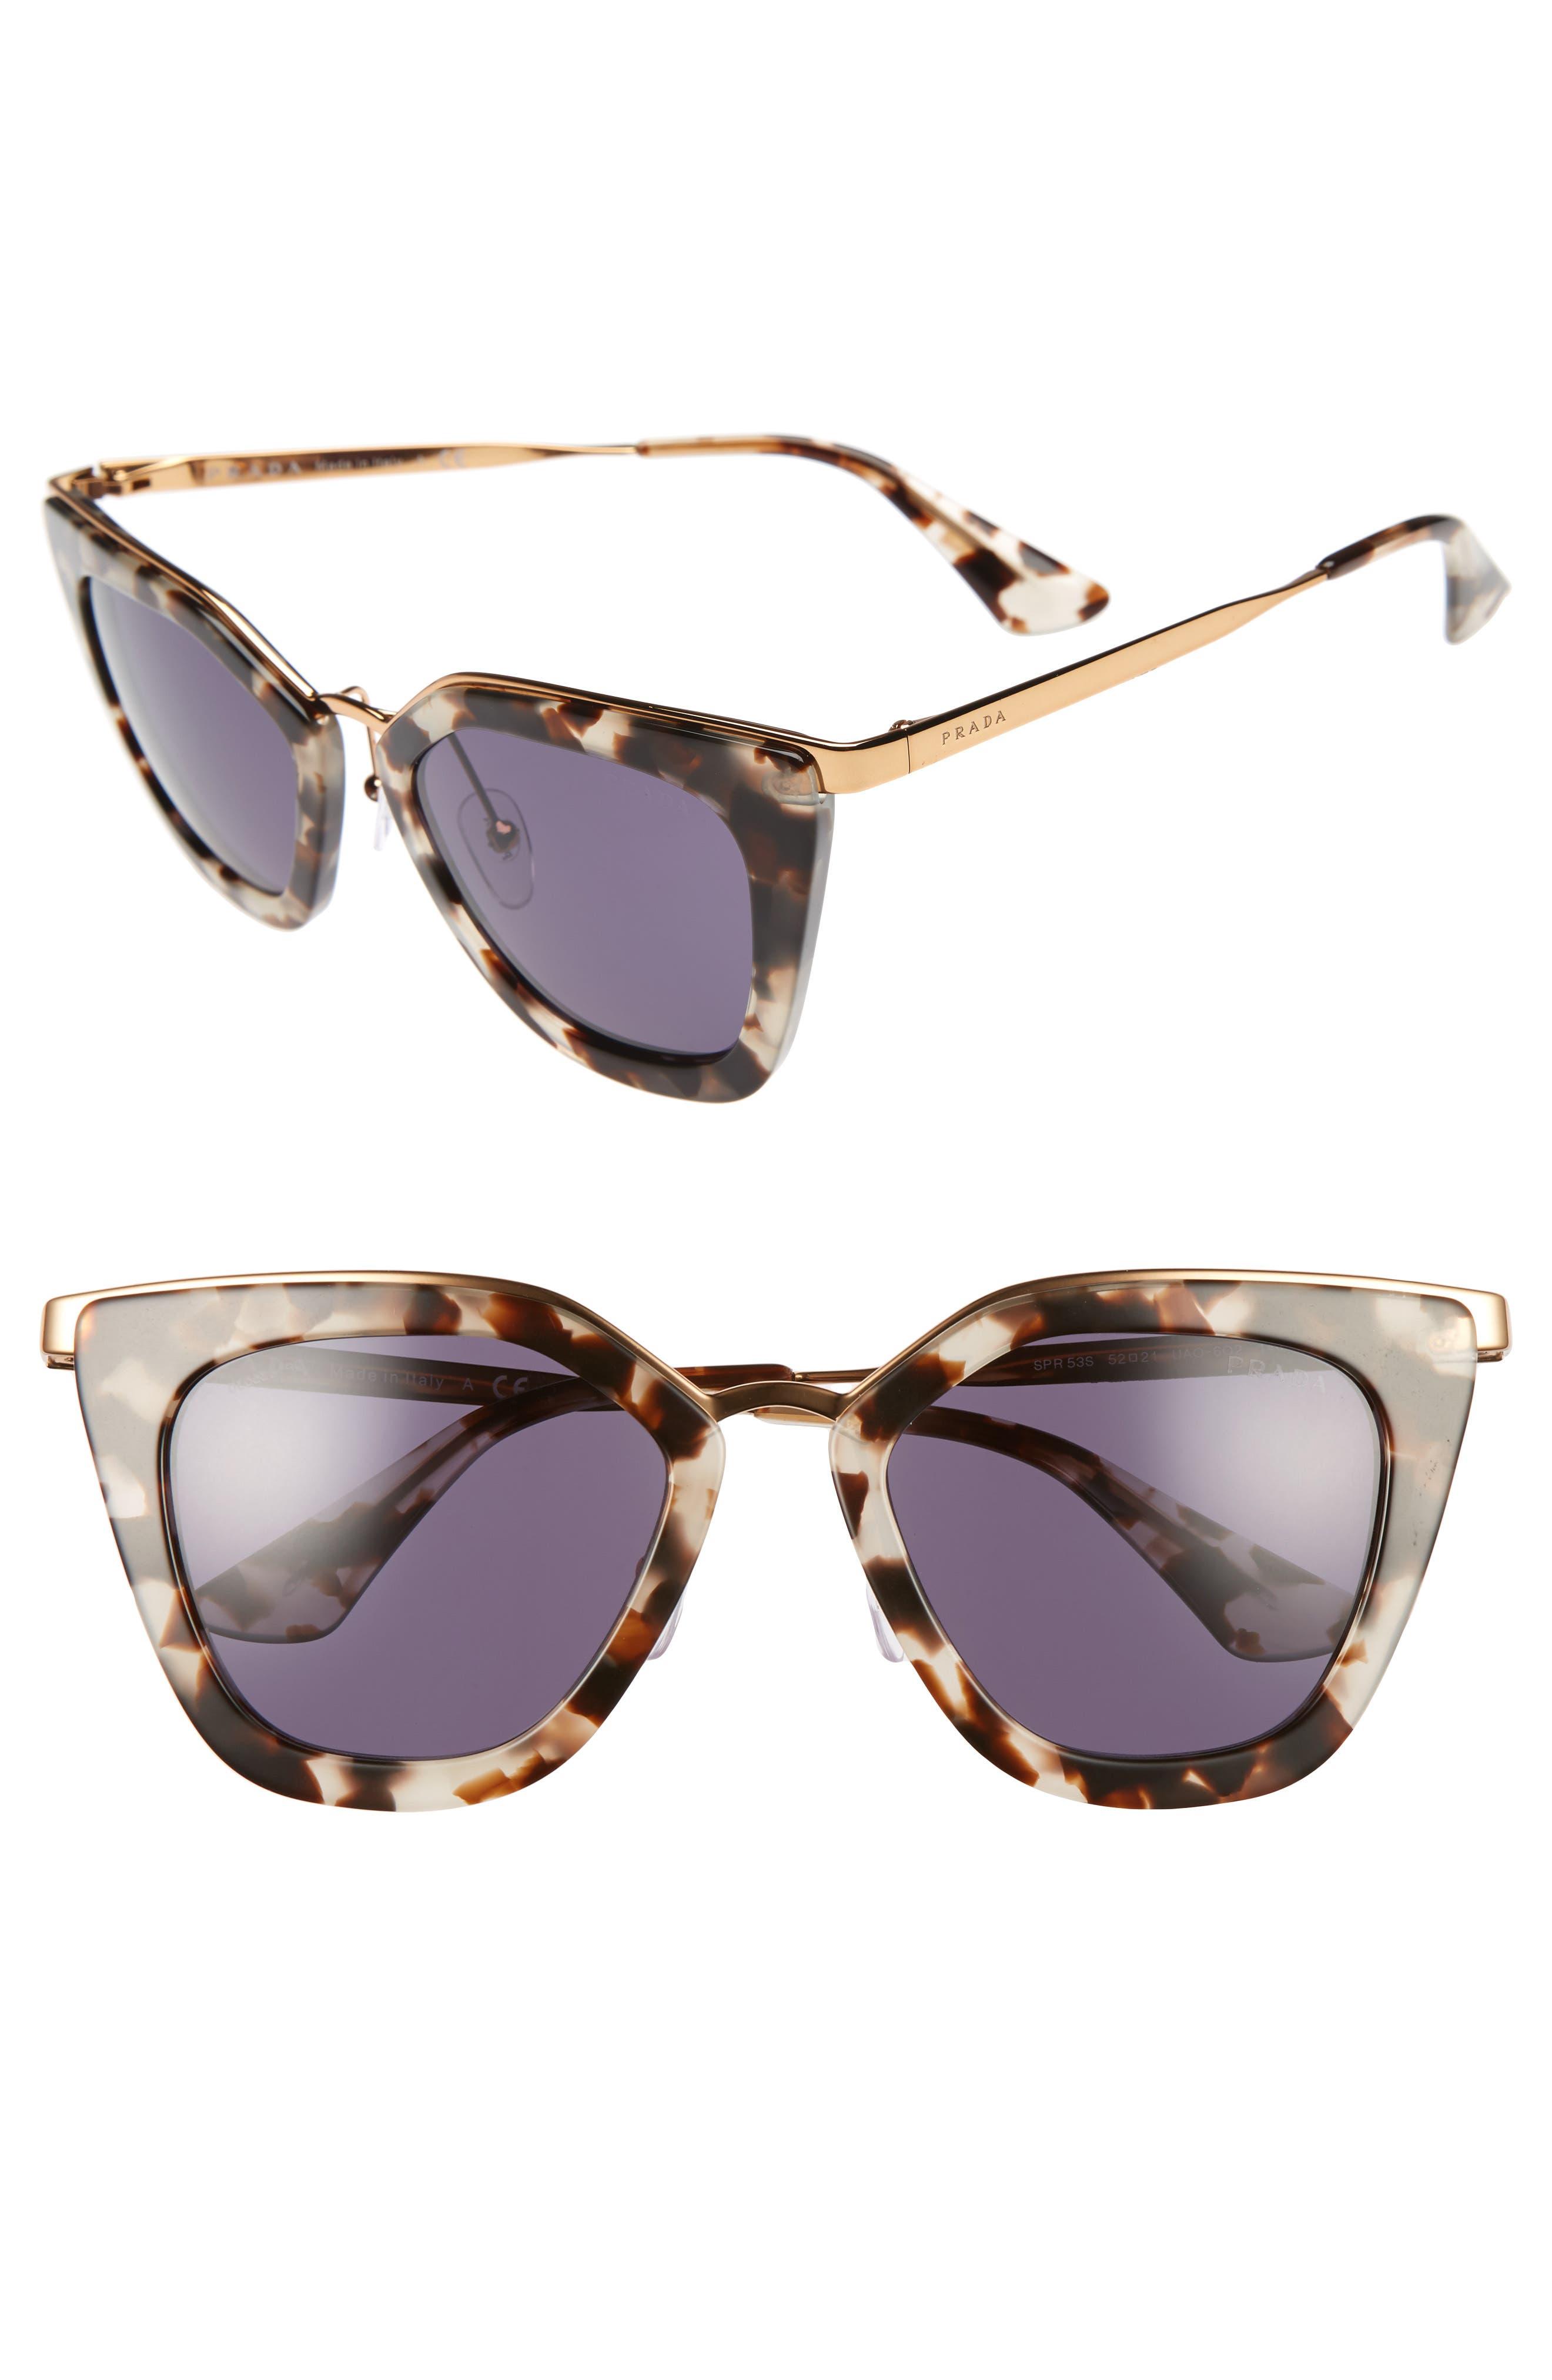 52mm Layered Frame Sunglasses,                         Main,                         color, White Havana